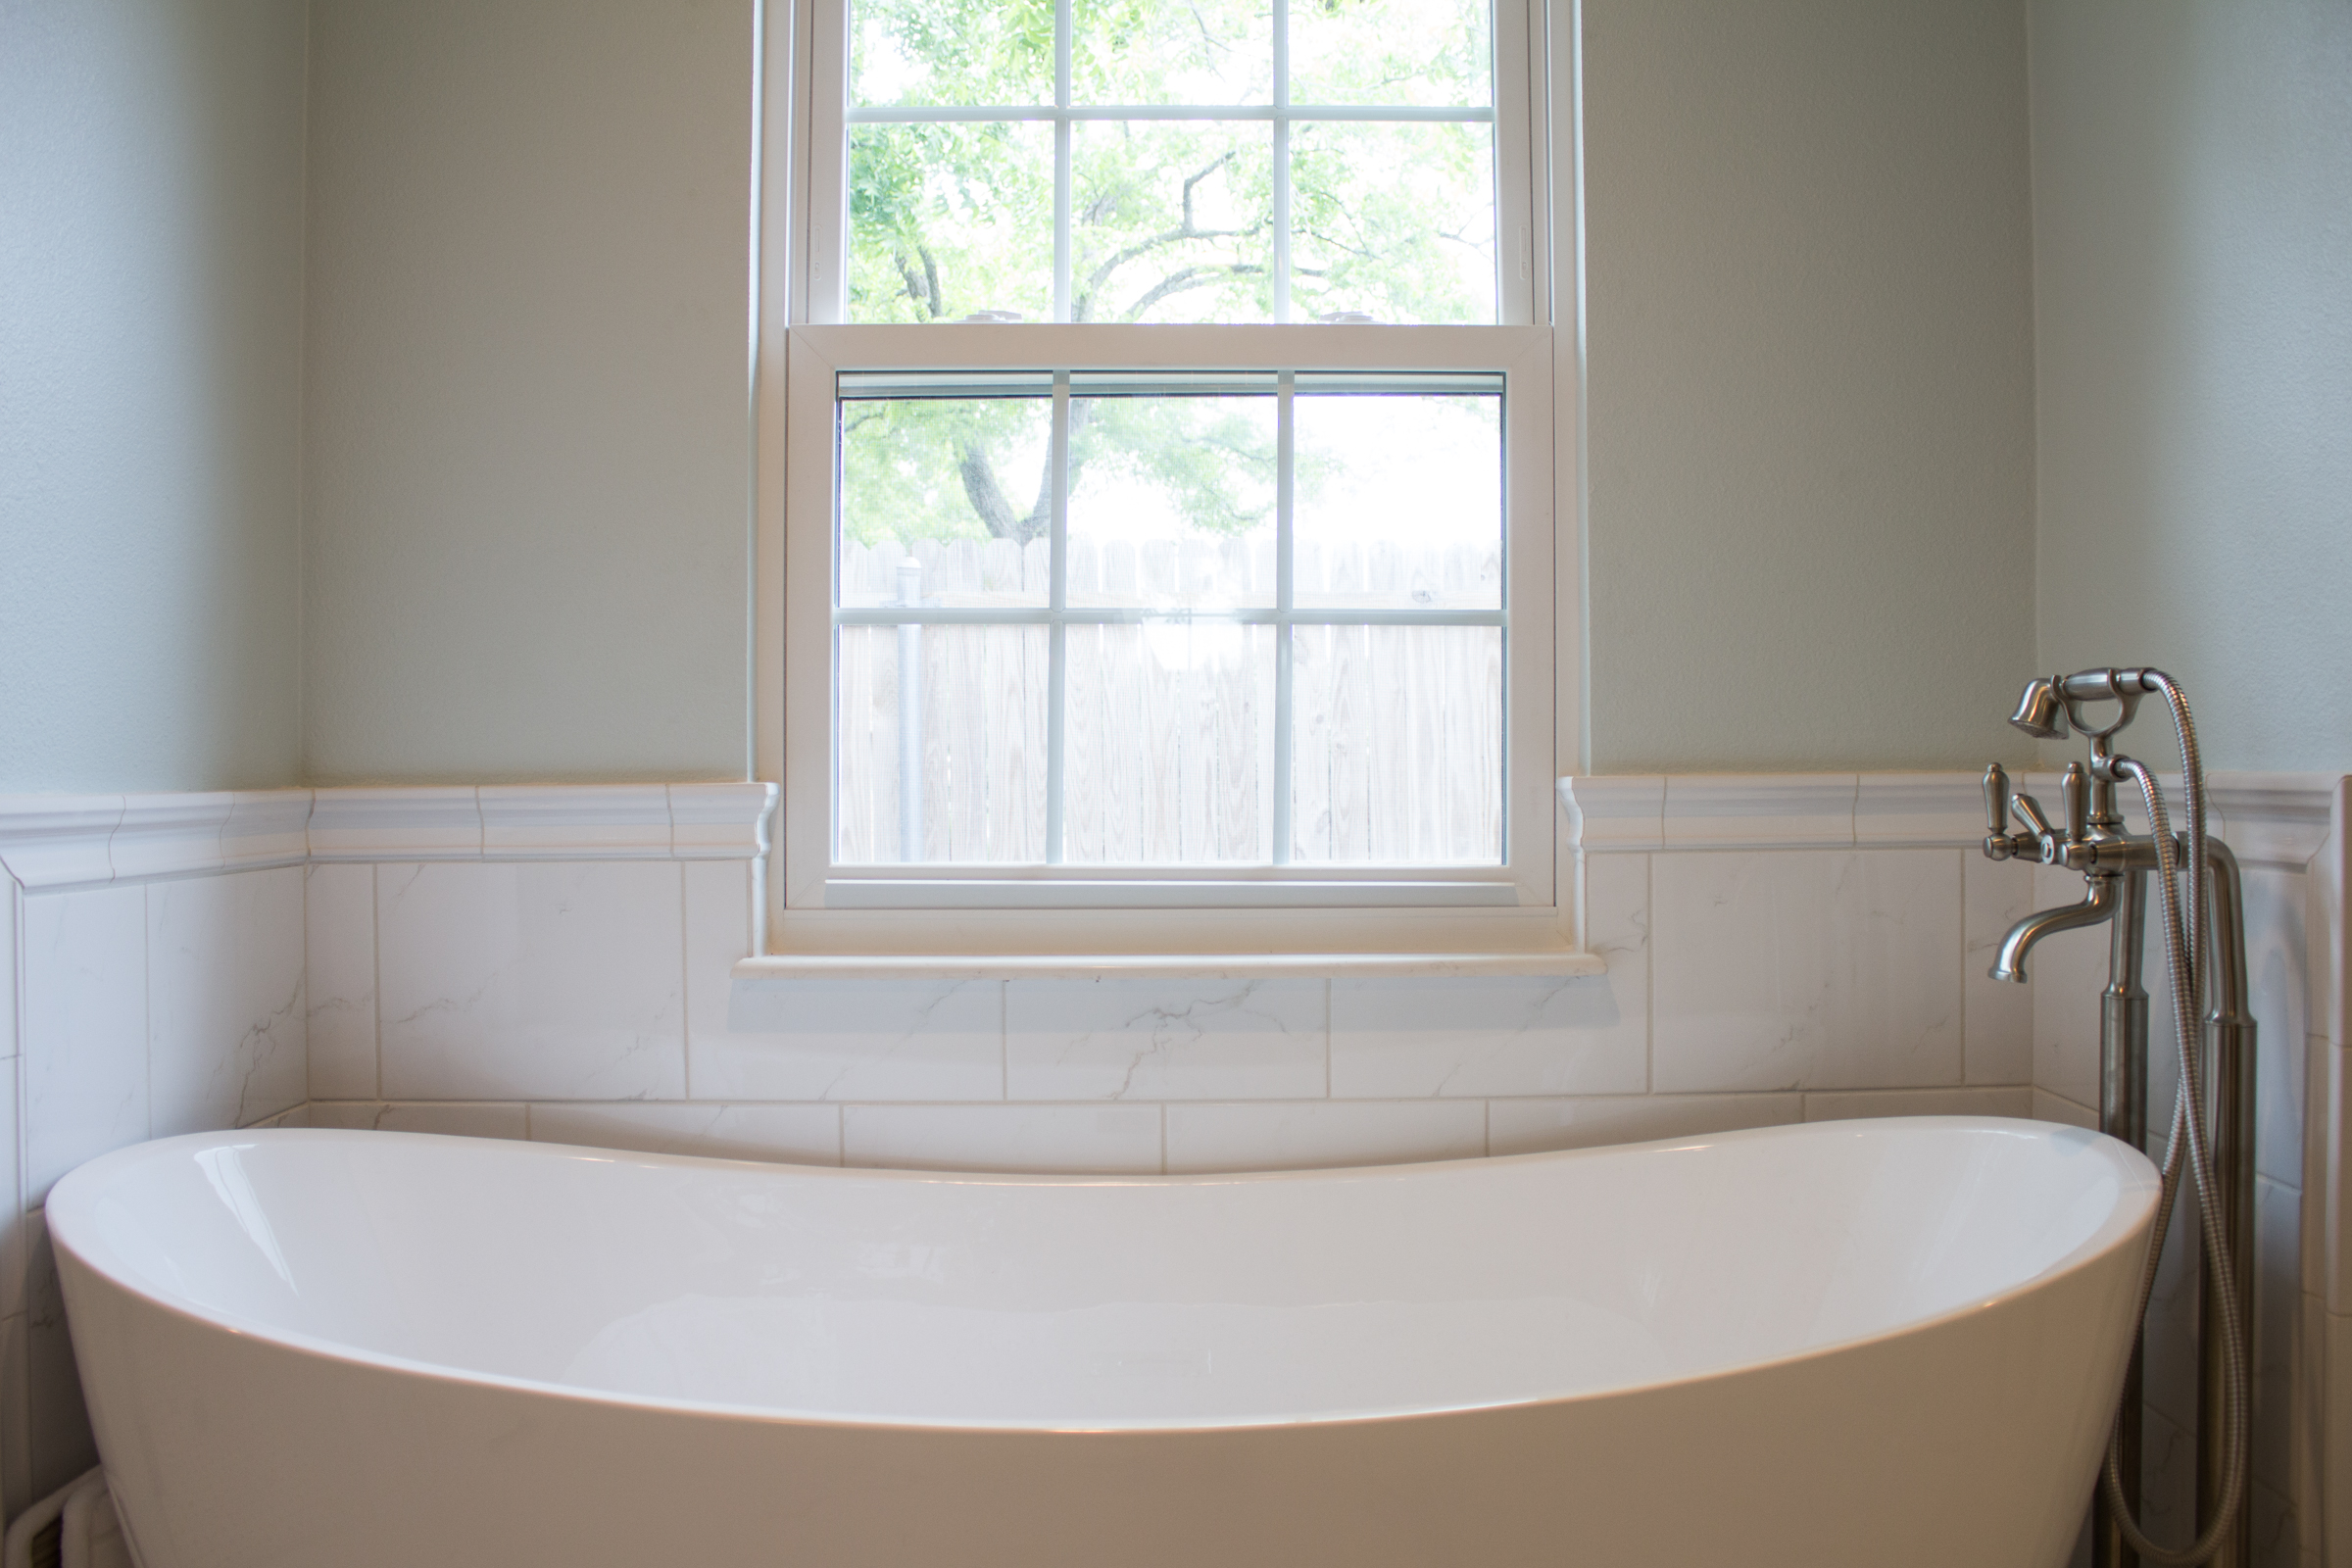 jarrell-signature-bathroom-remodeling